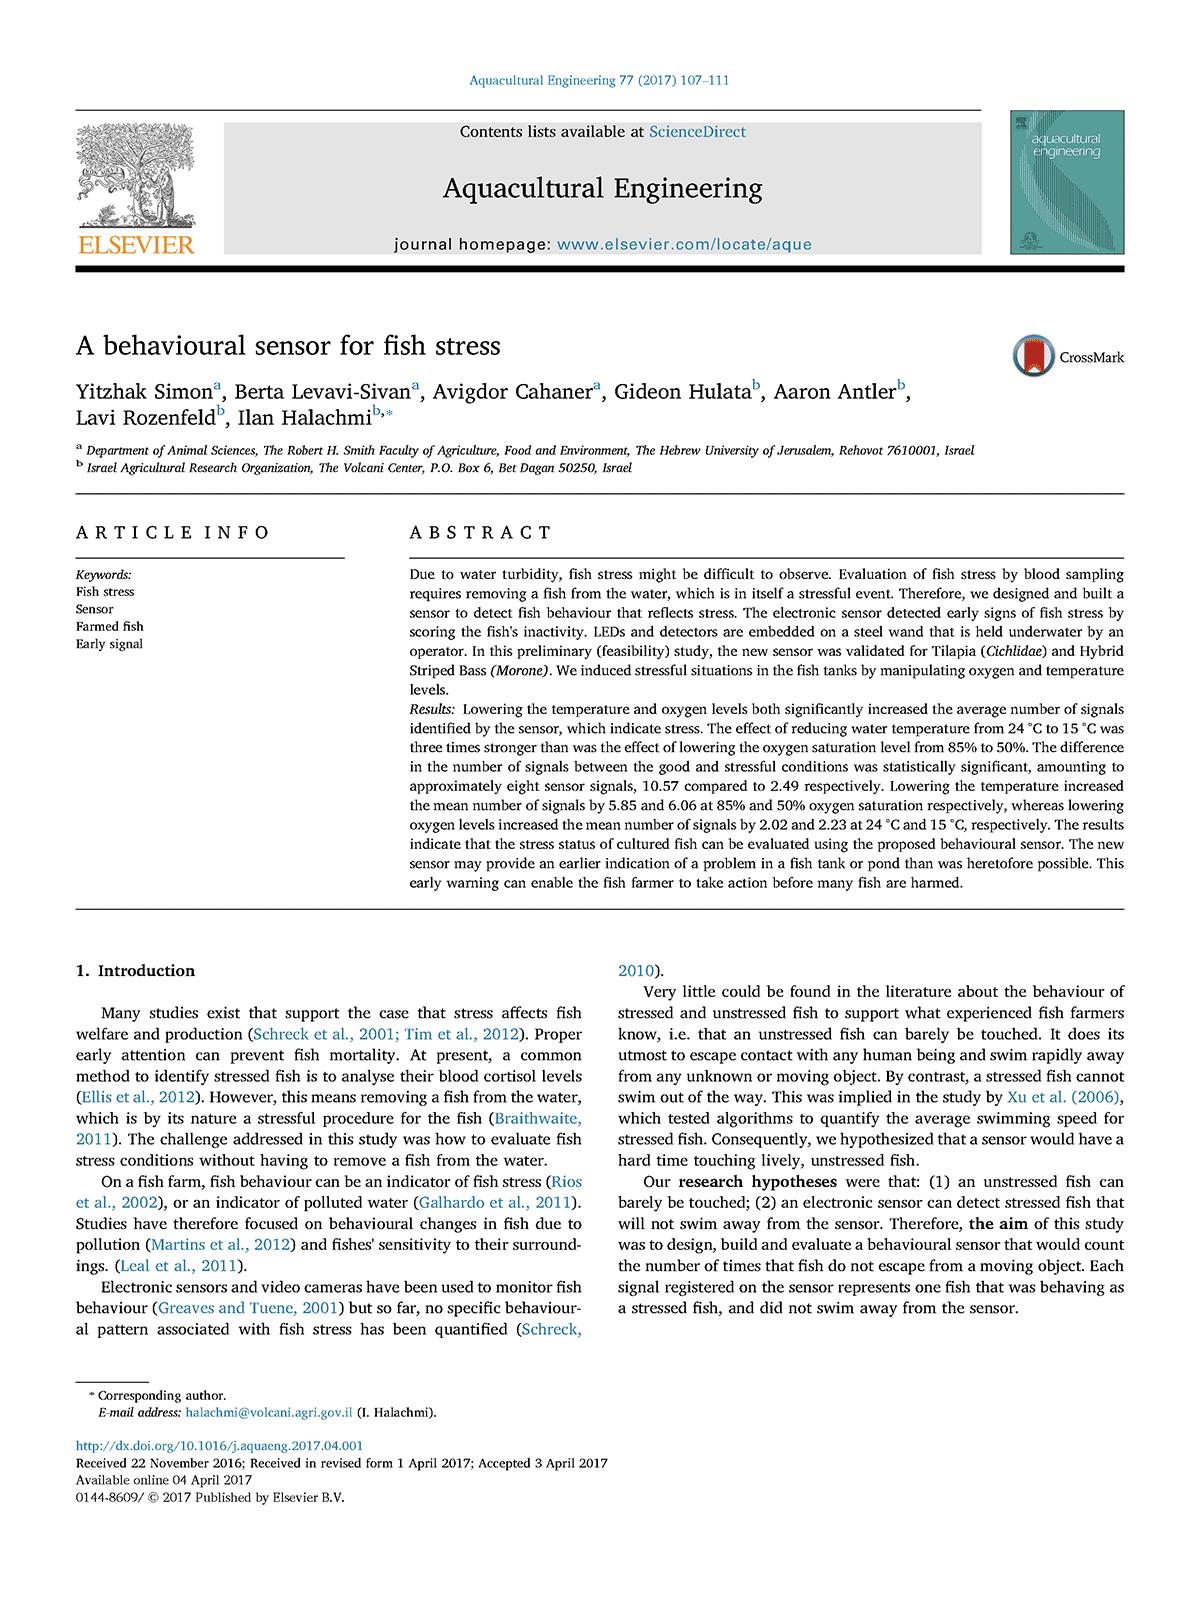 2017 simon aaron stick aqua Page 1